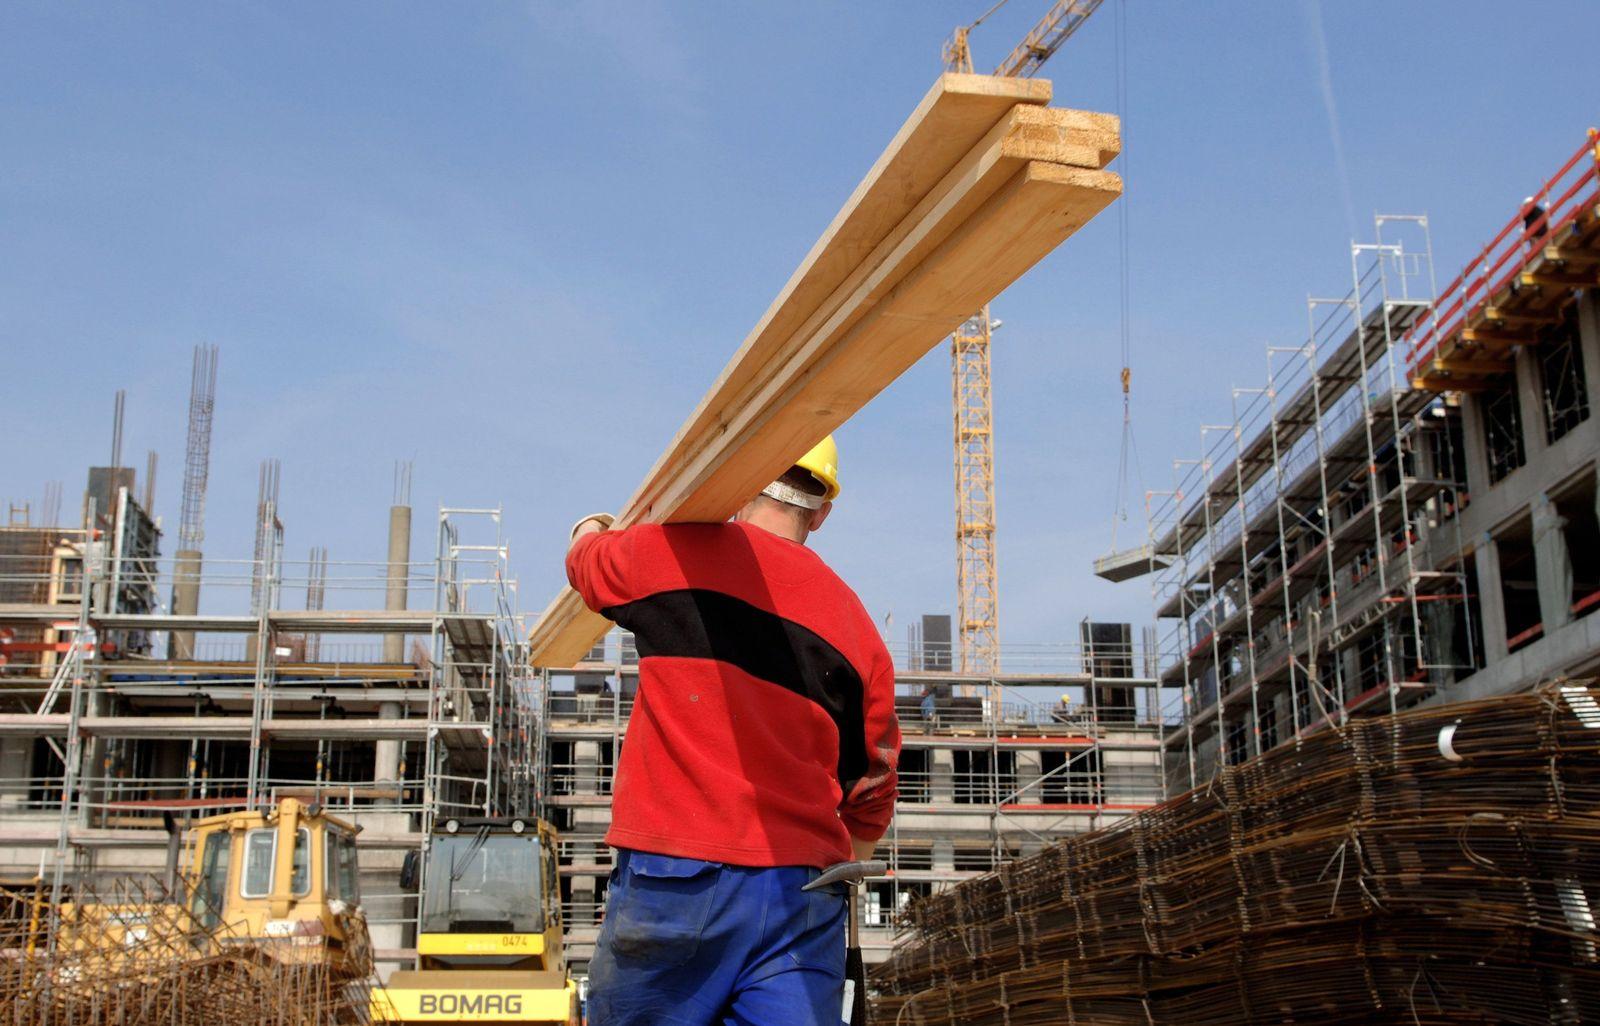 Bauarbeiter/ Baustelle